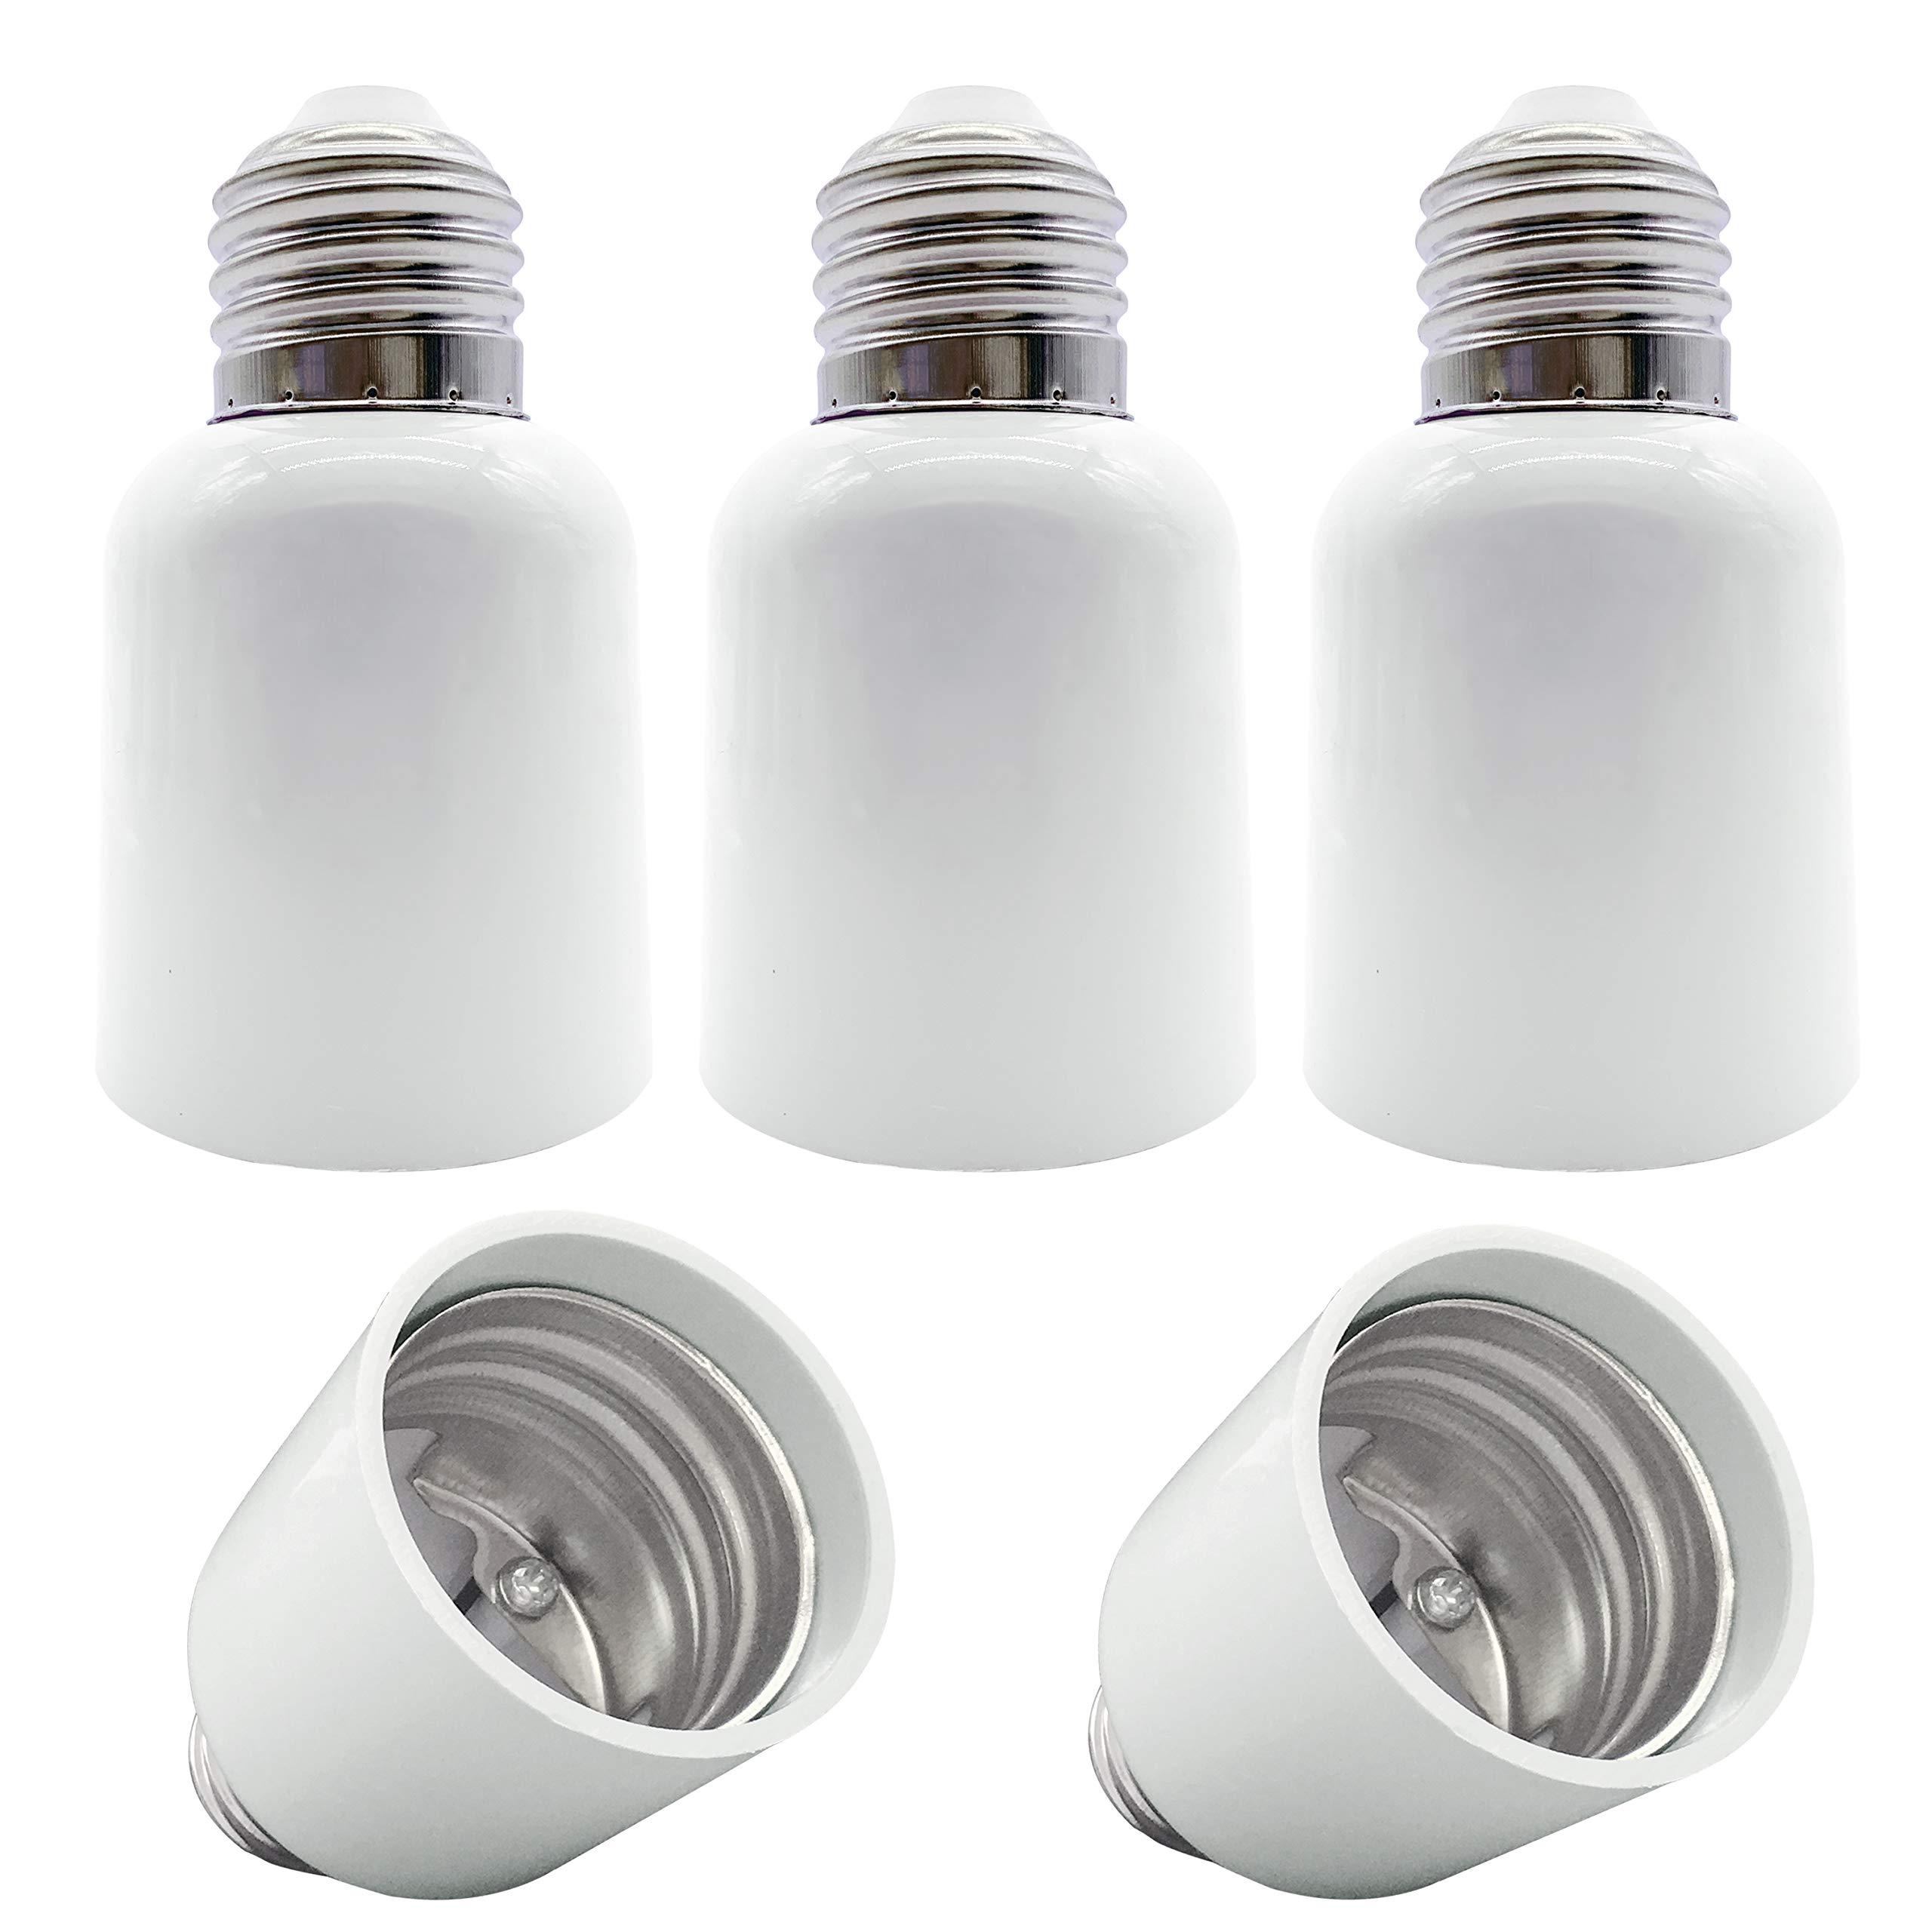 YAYZA! 5-Pack E26 E27 to E39 E40 Bulb Base Adapter, Medium to Goliath Edison Screw Light Socket Converter, Heat Resistant Up to 200℃ No Fire Hazard